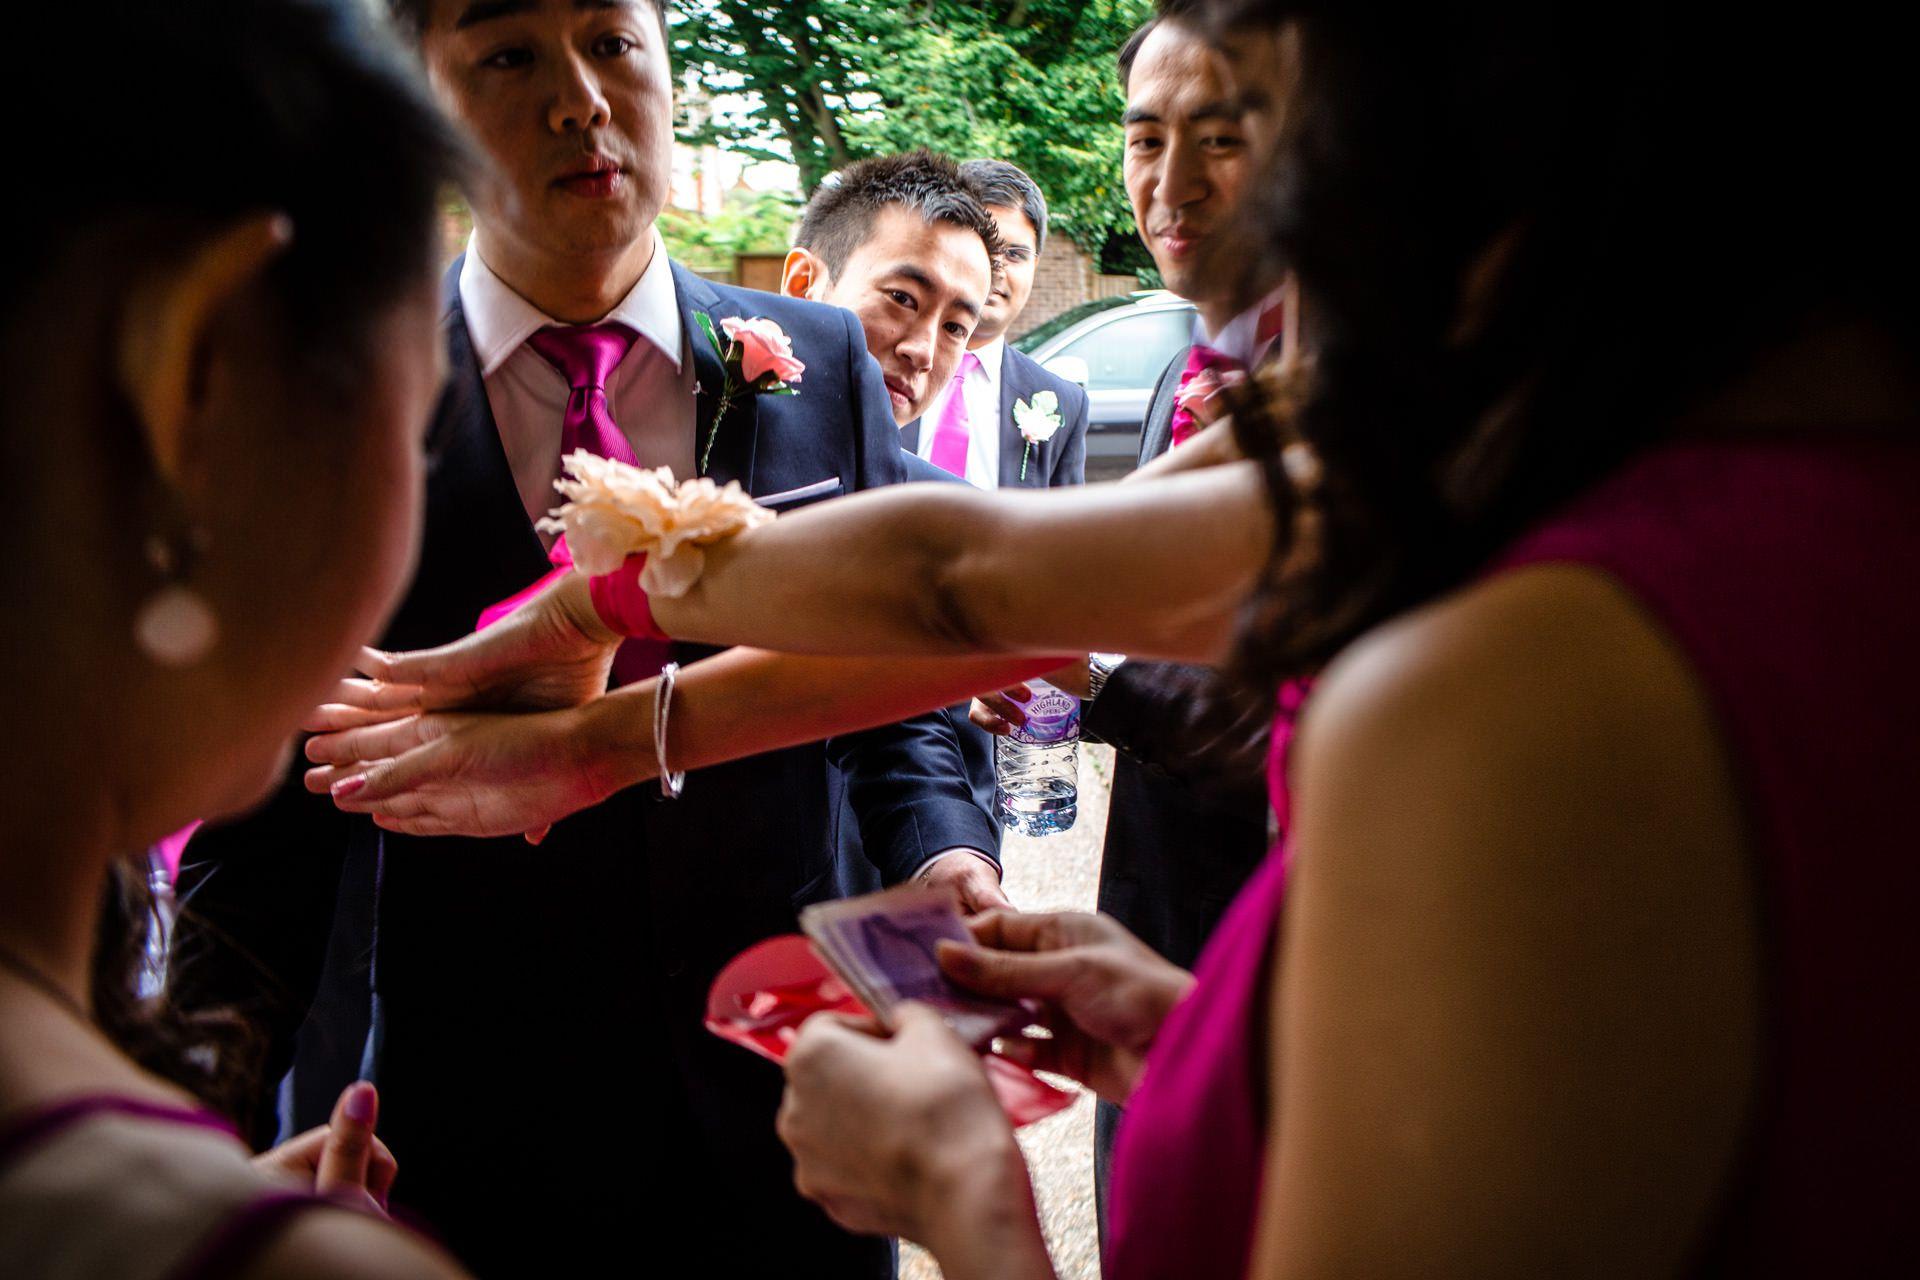 Chinese Wedding photo of haggling